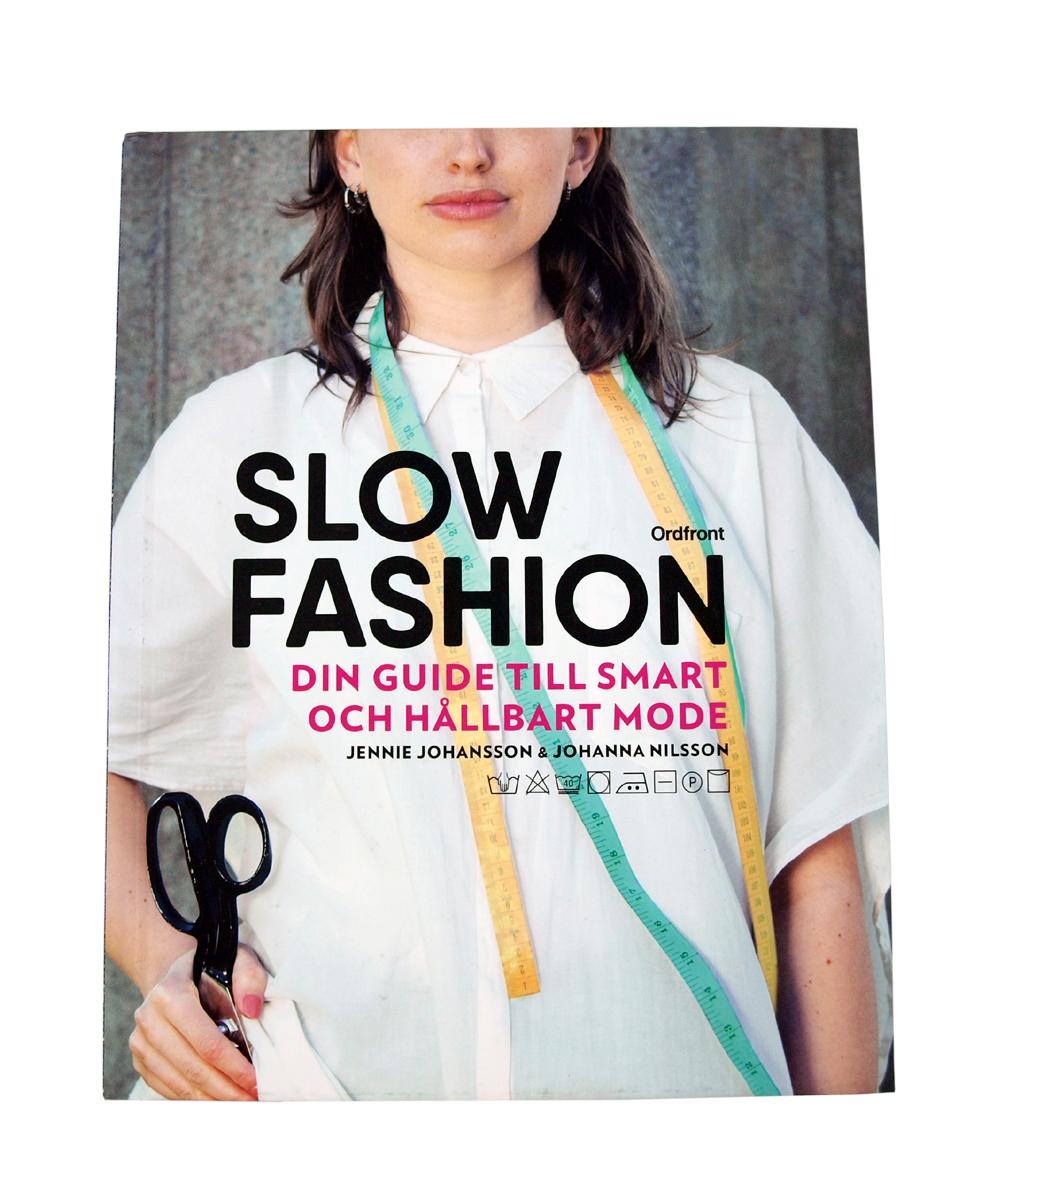 Bok Slow Fashion Jennie Johansson och Johanna Nilsson